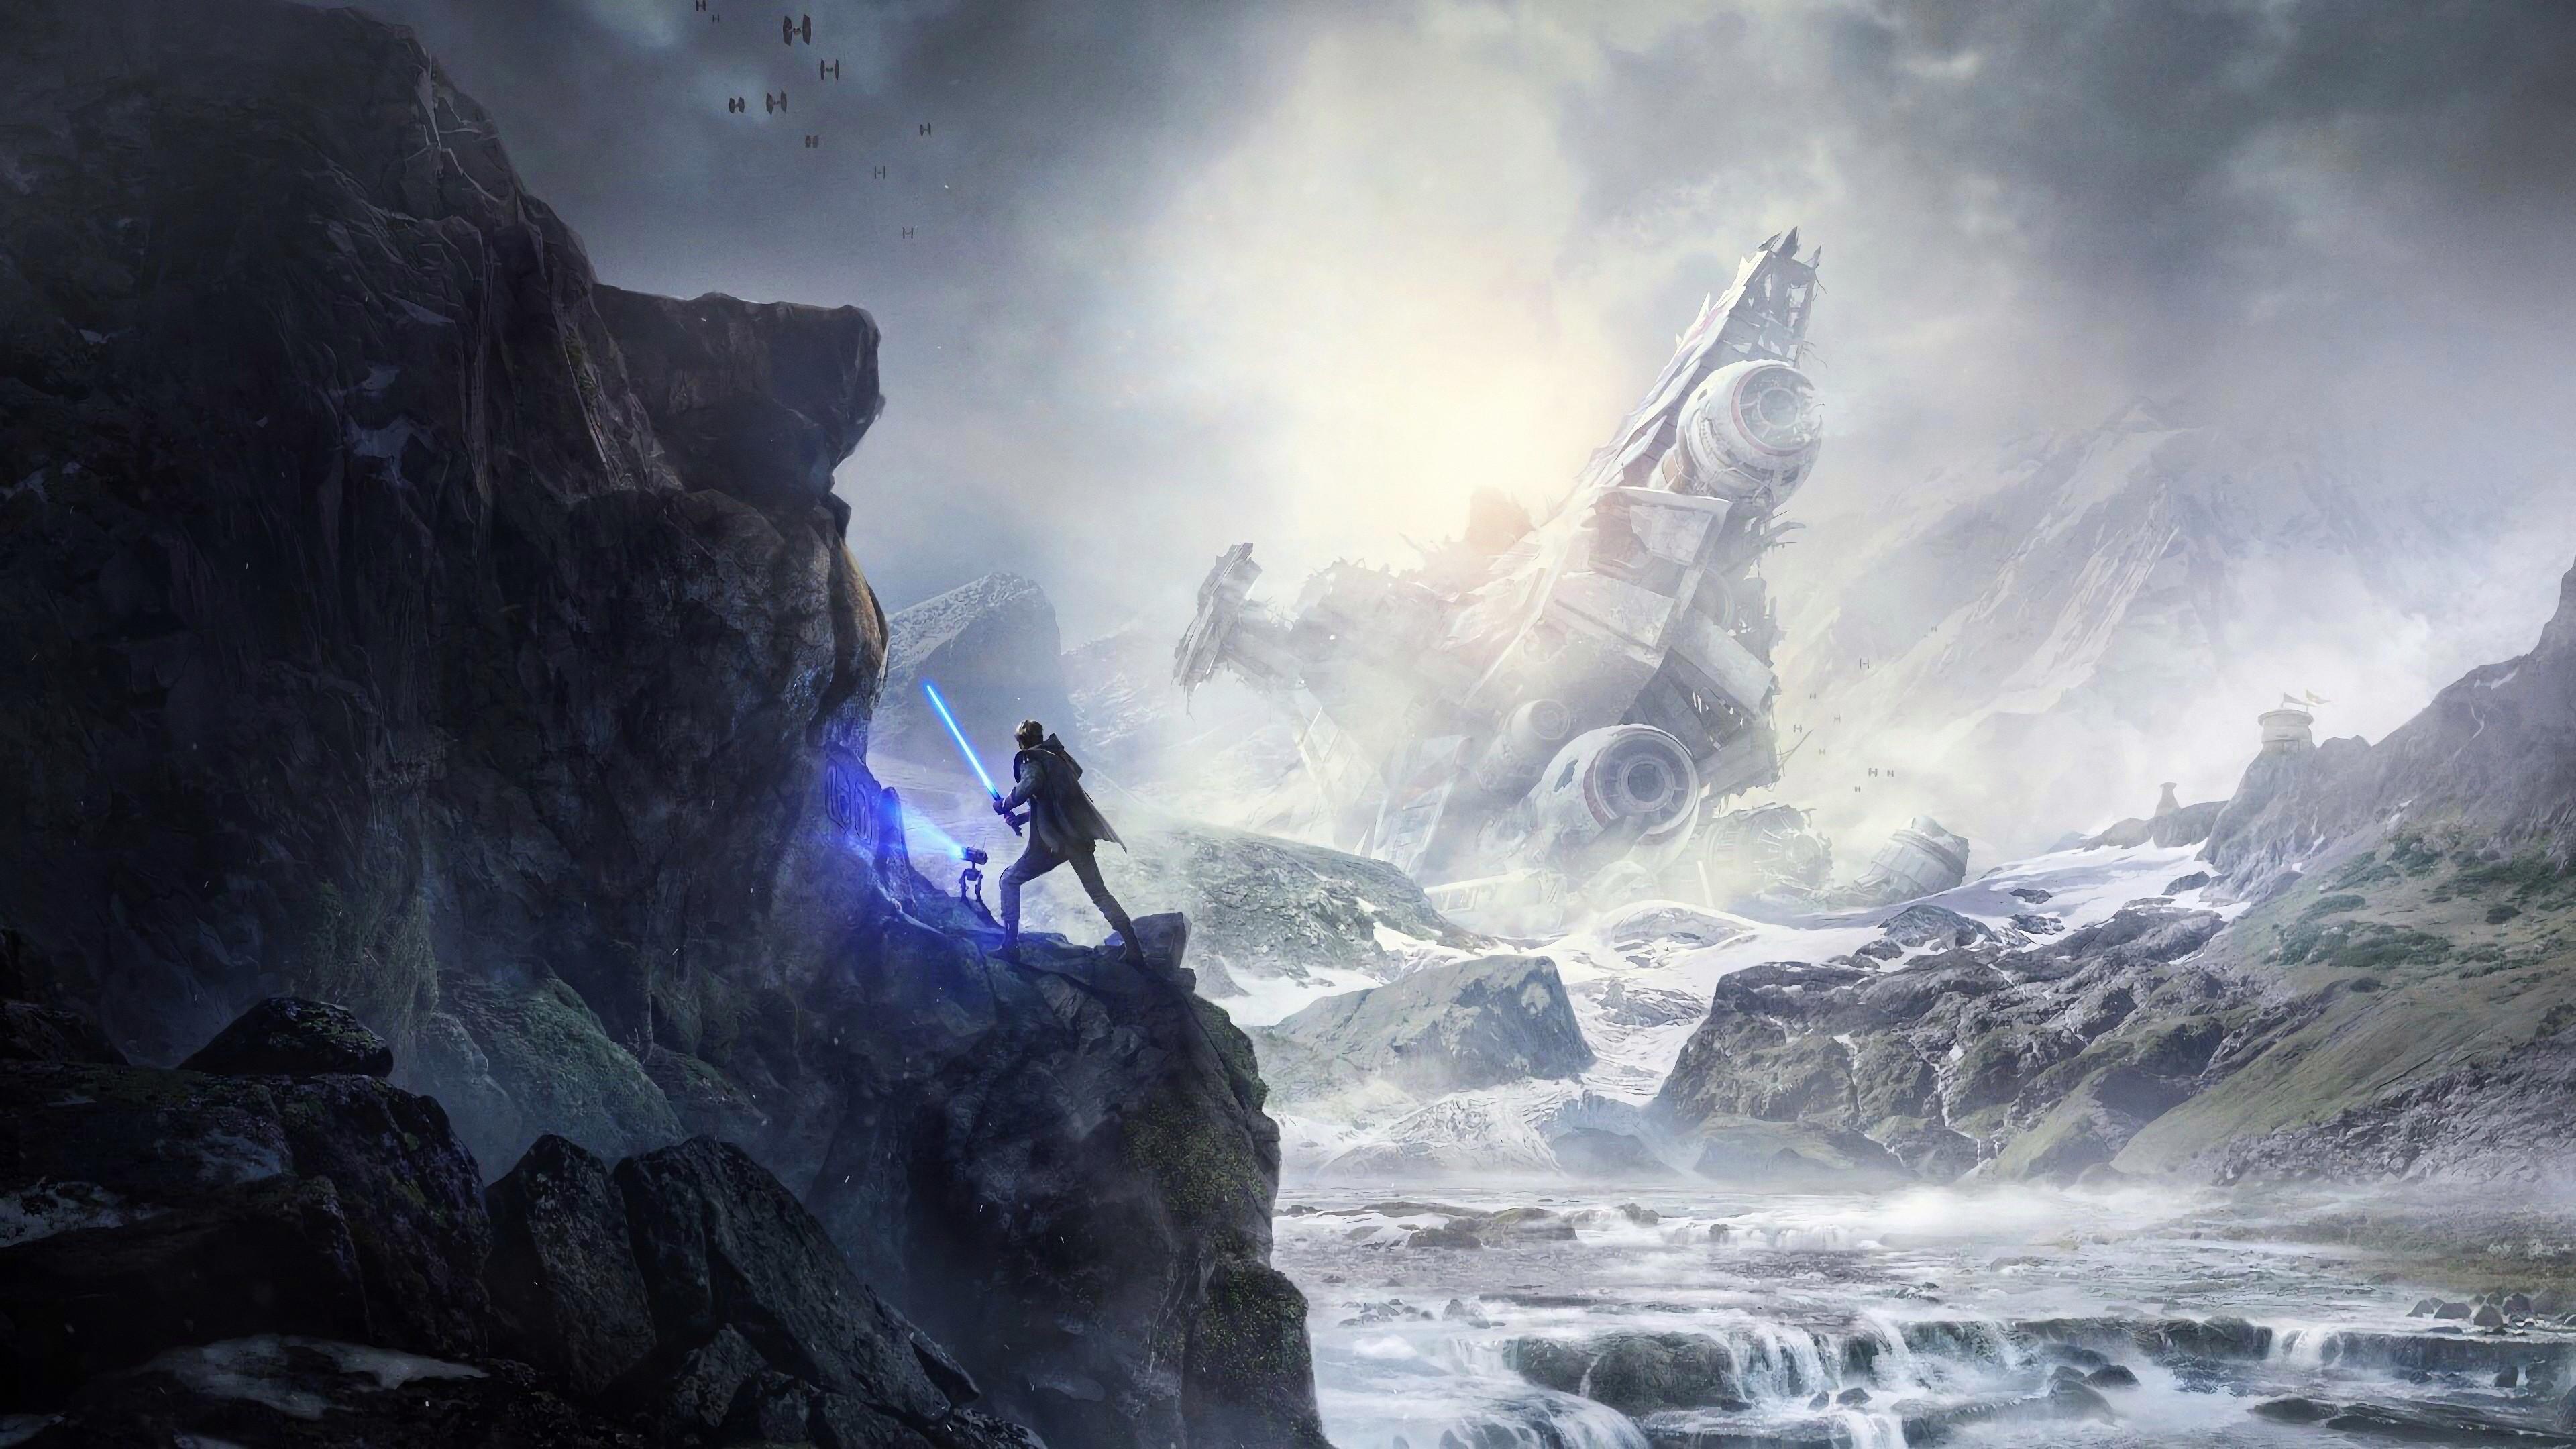 Star Wars 9 Wallpapers Wallpaper Cave